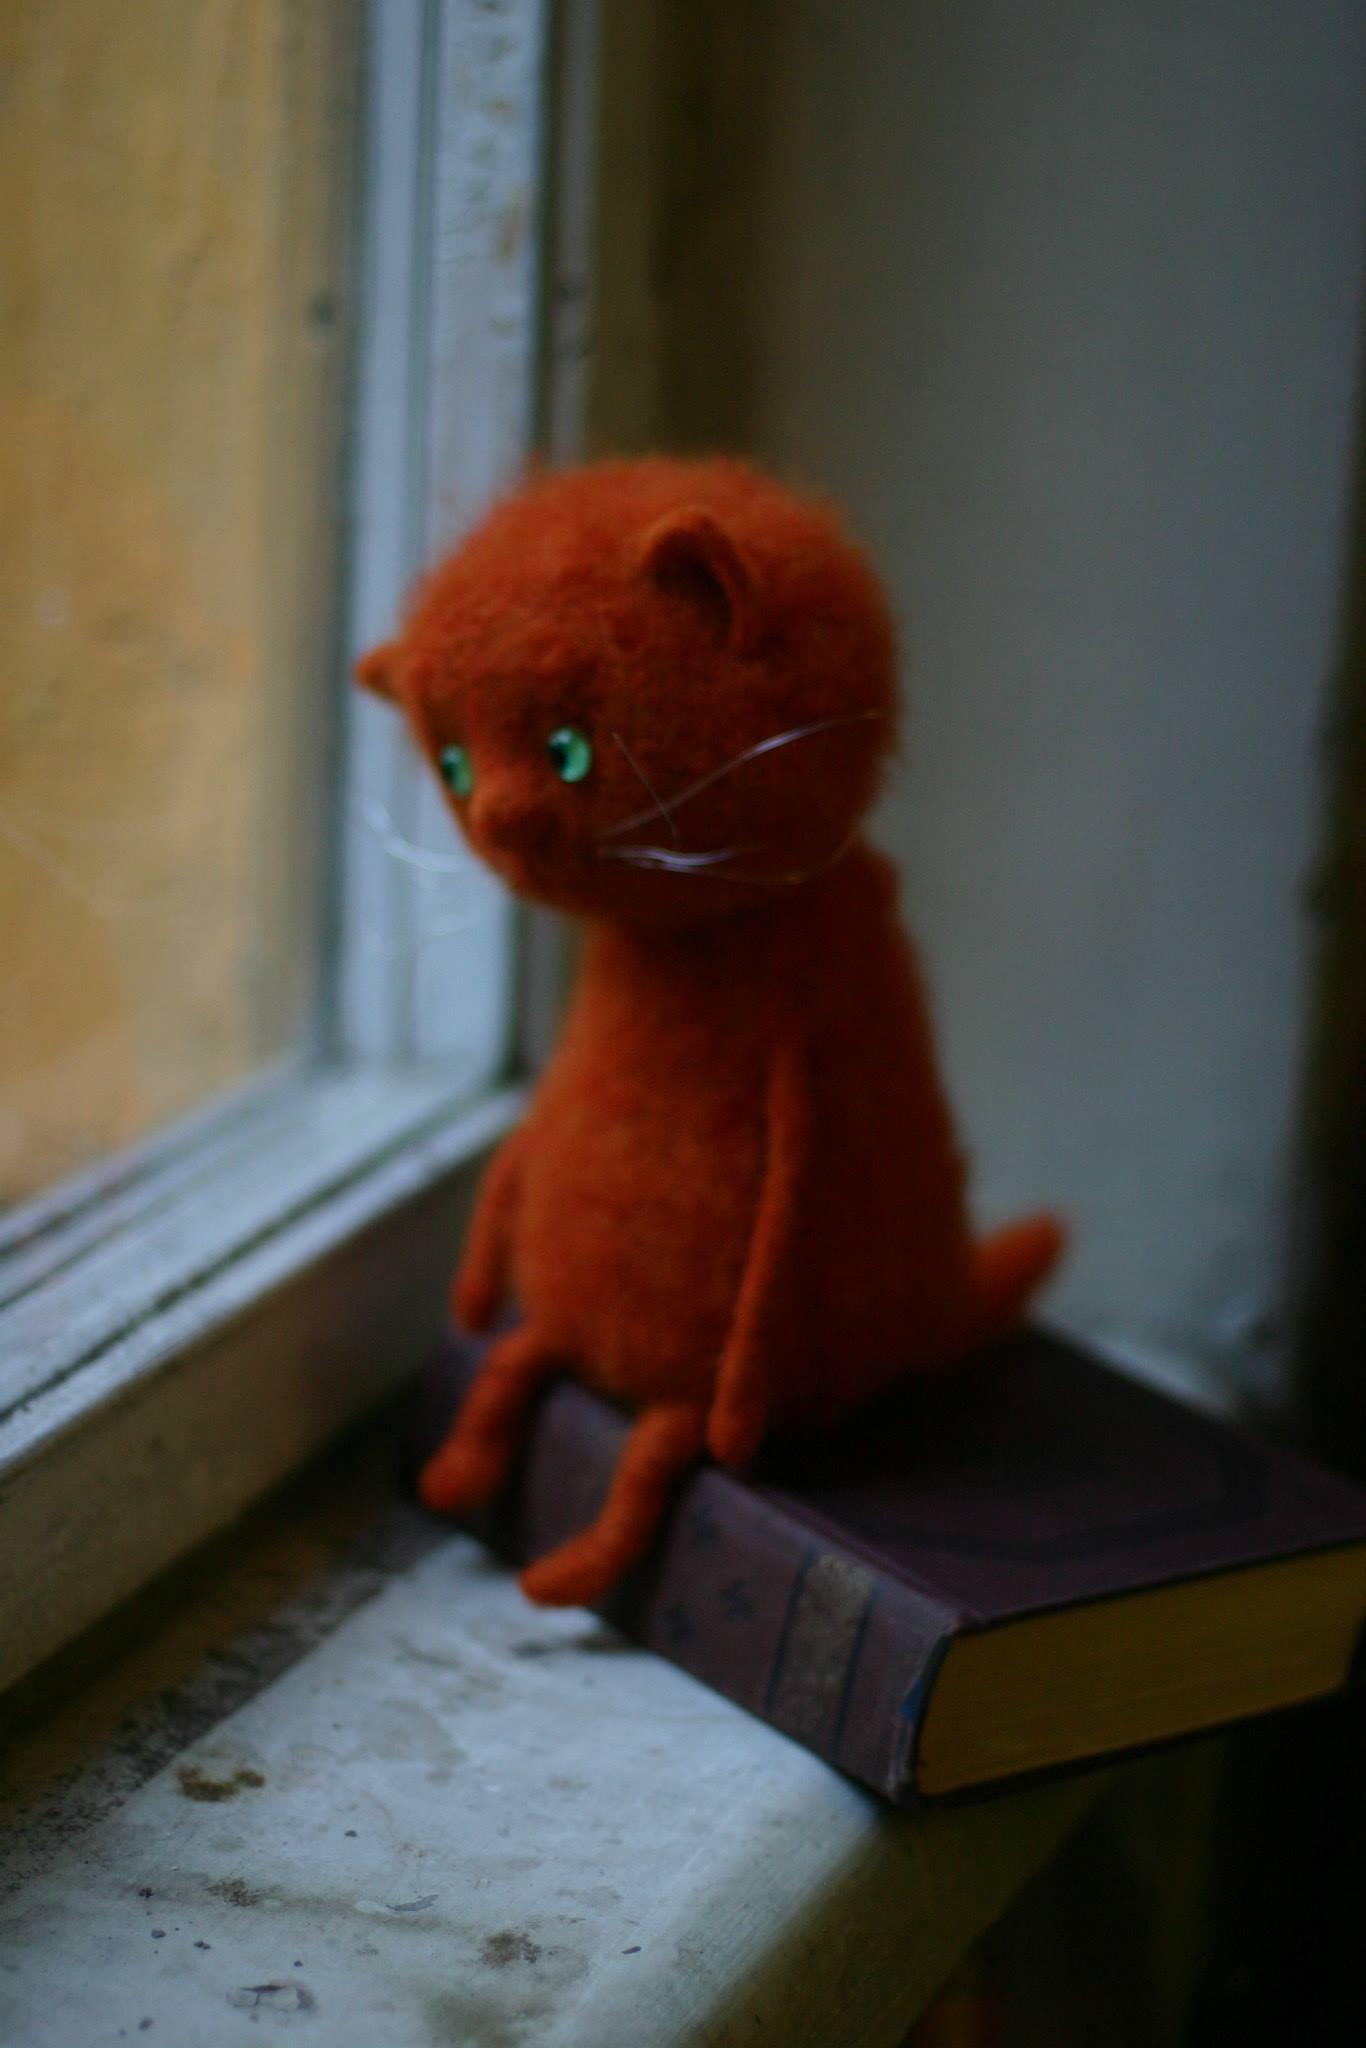 cutest-felt-kids-toys-ever-by-katerina-kozubenko-28.jpg